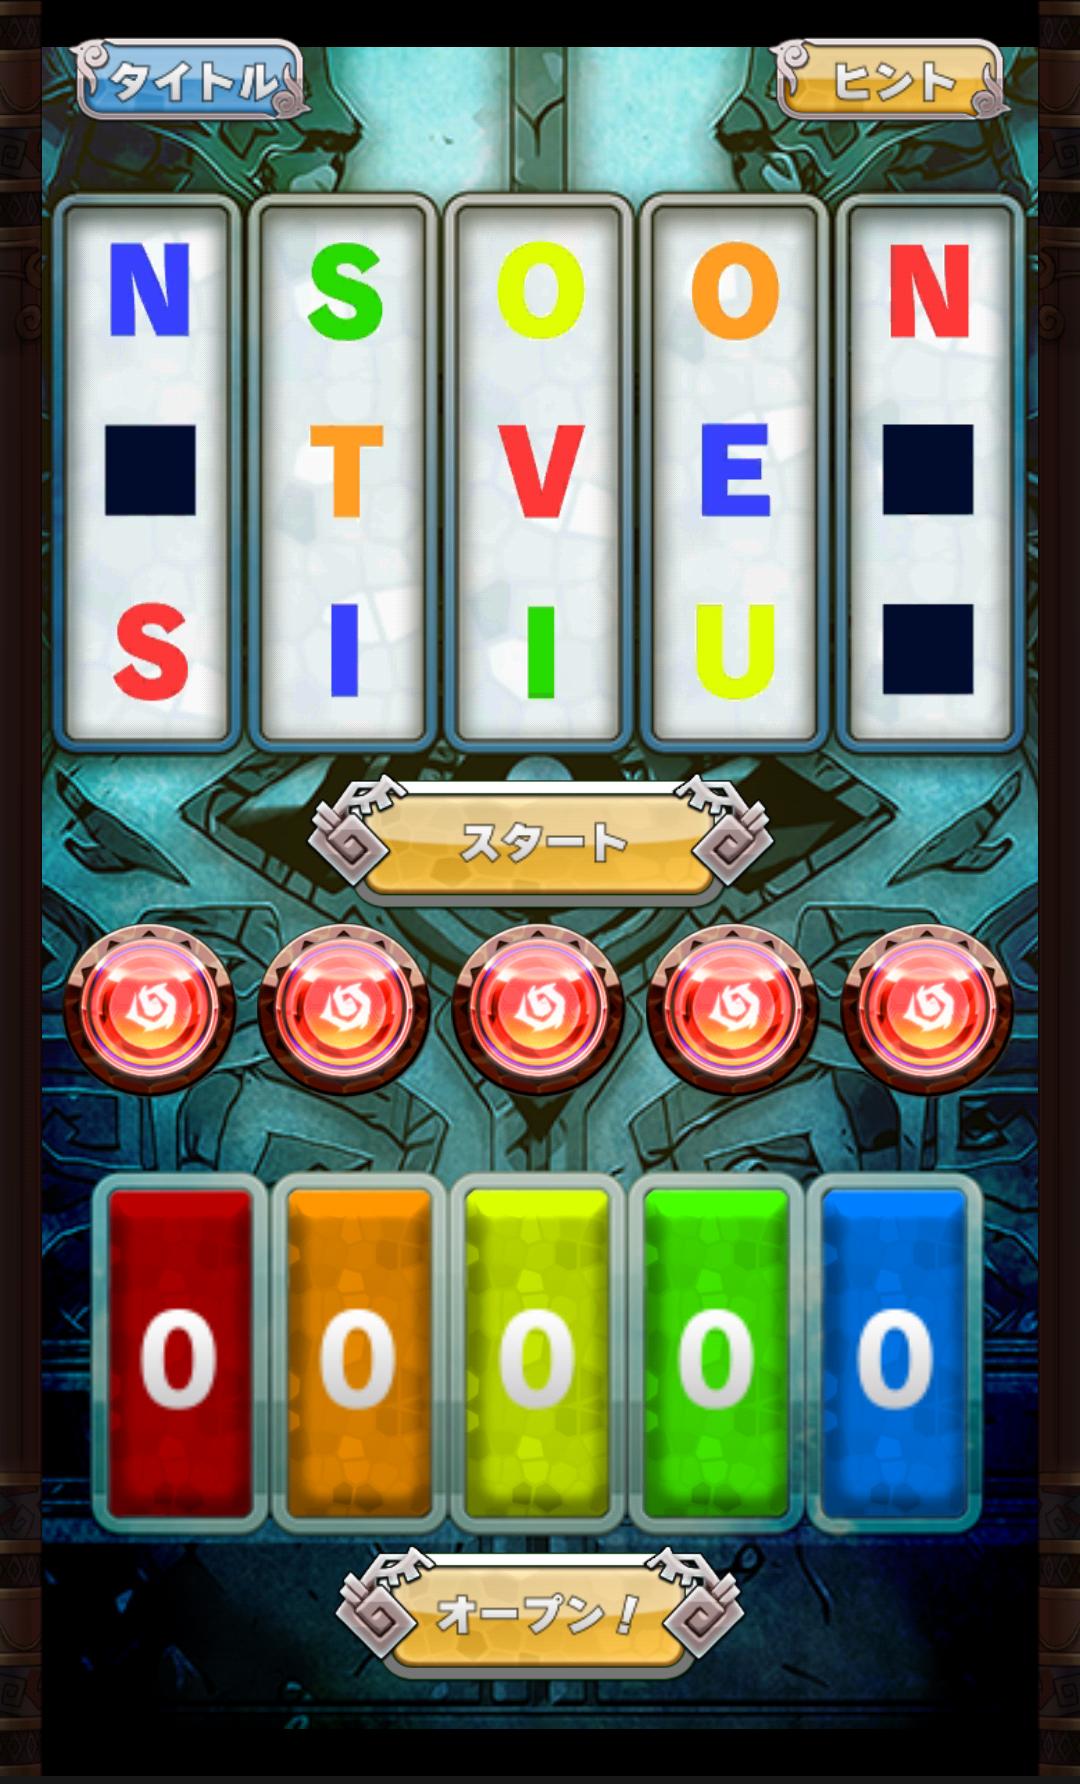 androidアプリ アニモン 人魚姫マーメの冒険攻略スクリーンショット7